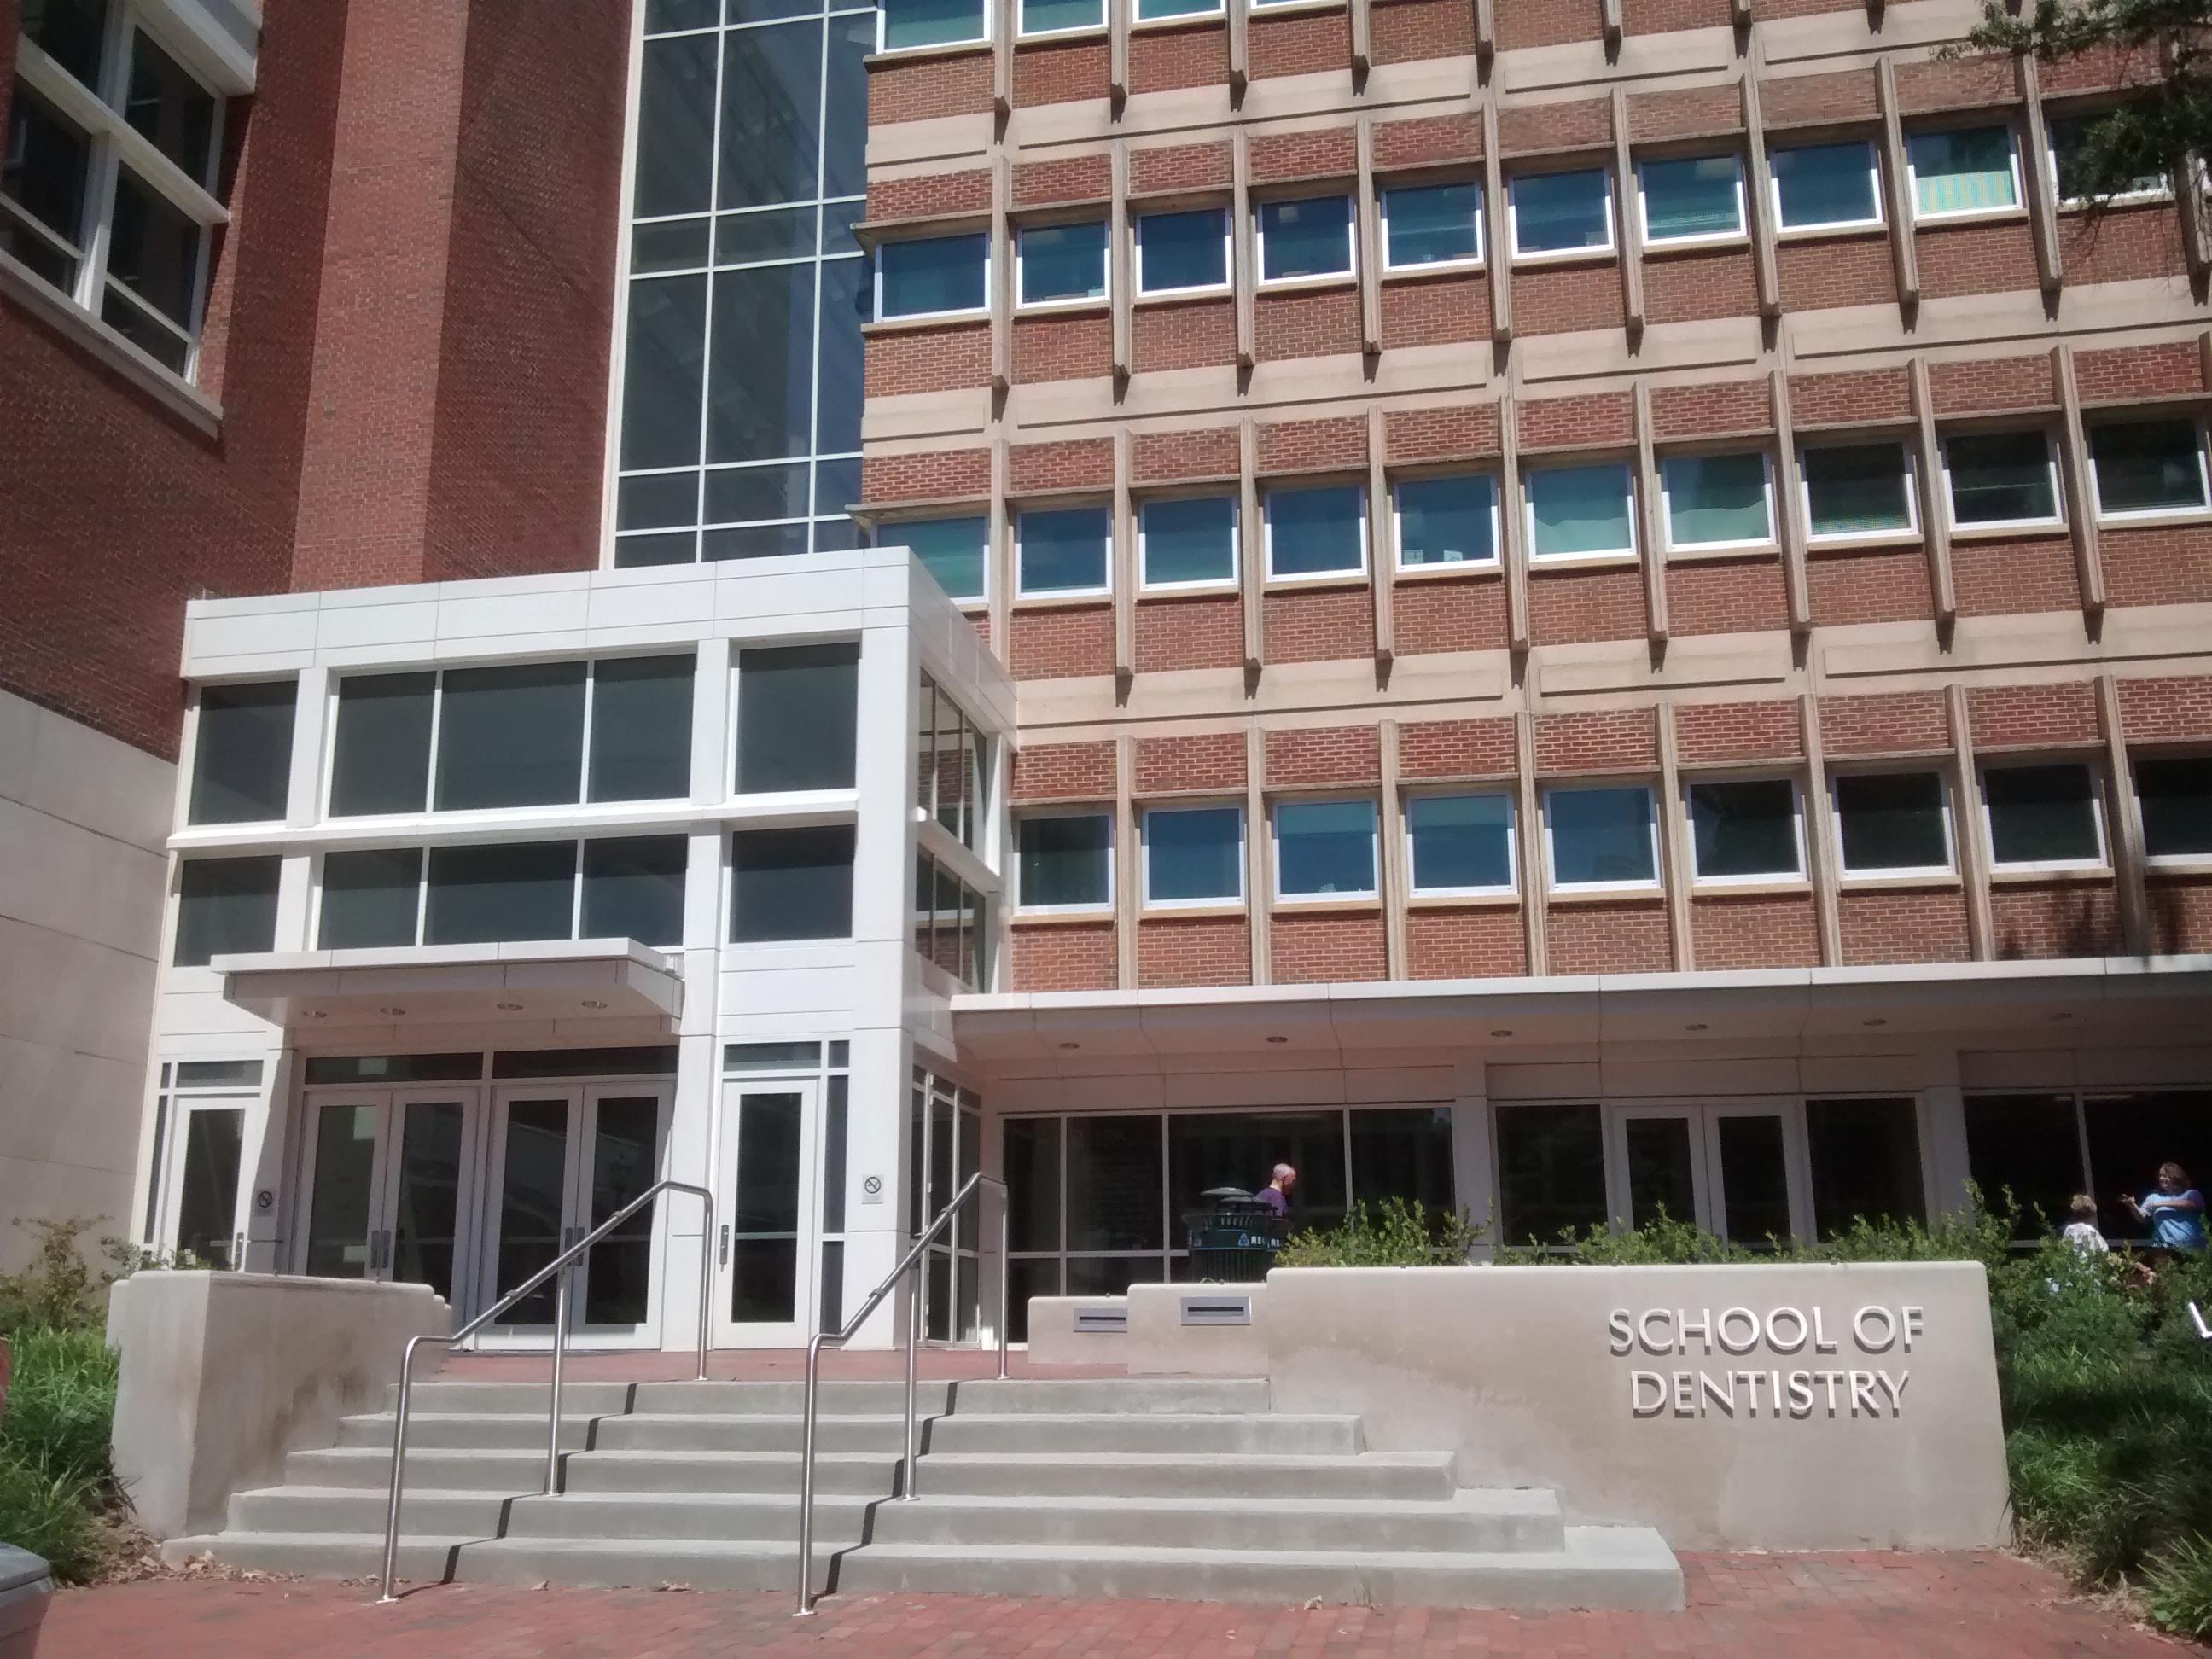 UNC School of Dentistry - Wikipedia